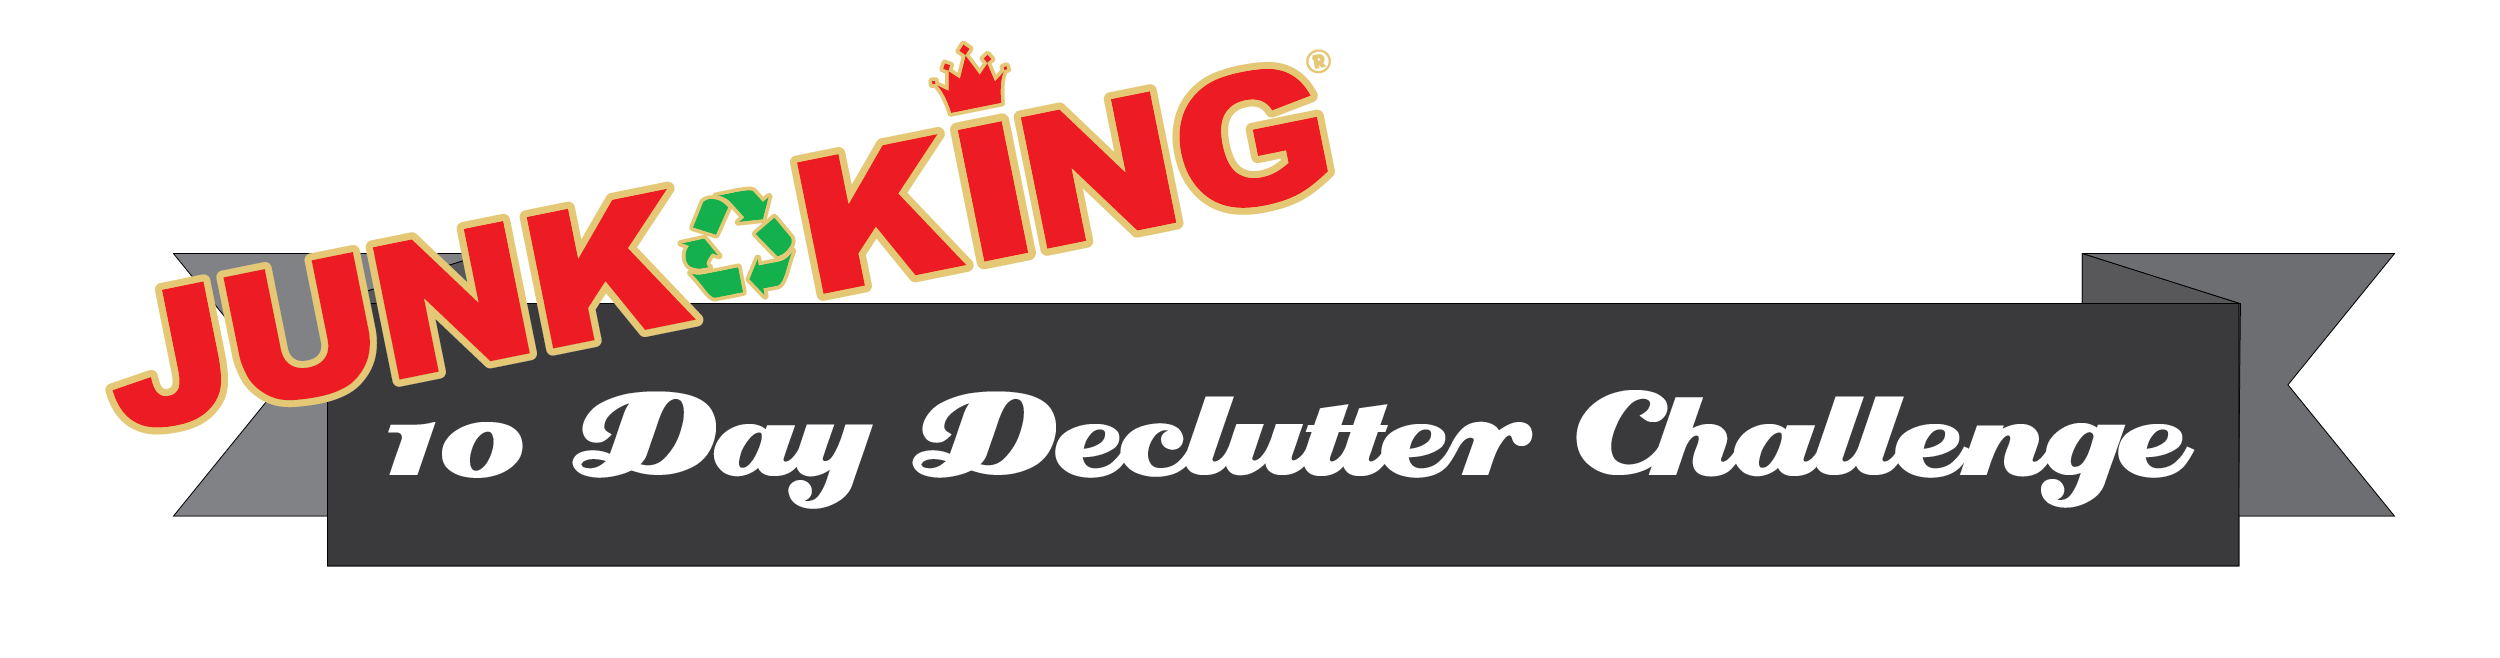 Junk King Declutter Challenge